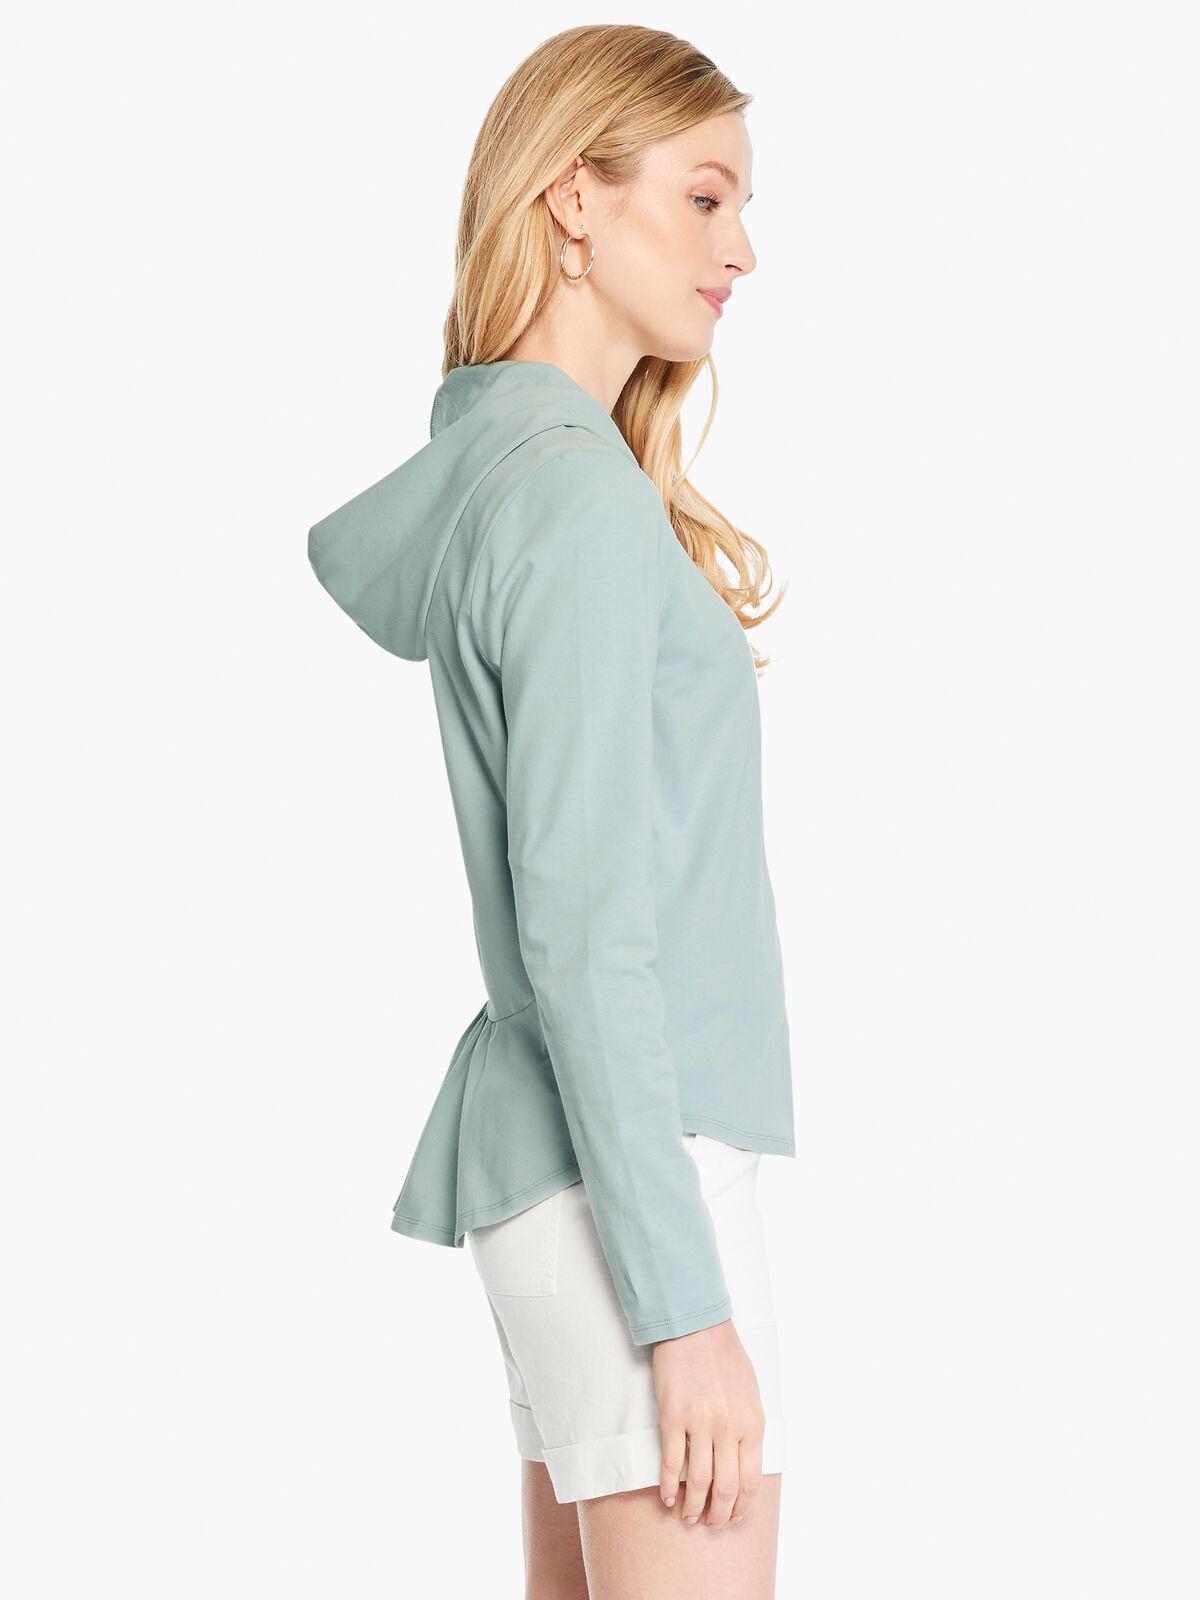 Ruffled Up Perfect Knit Jacket